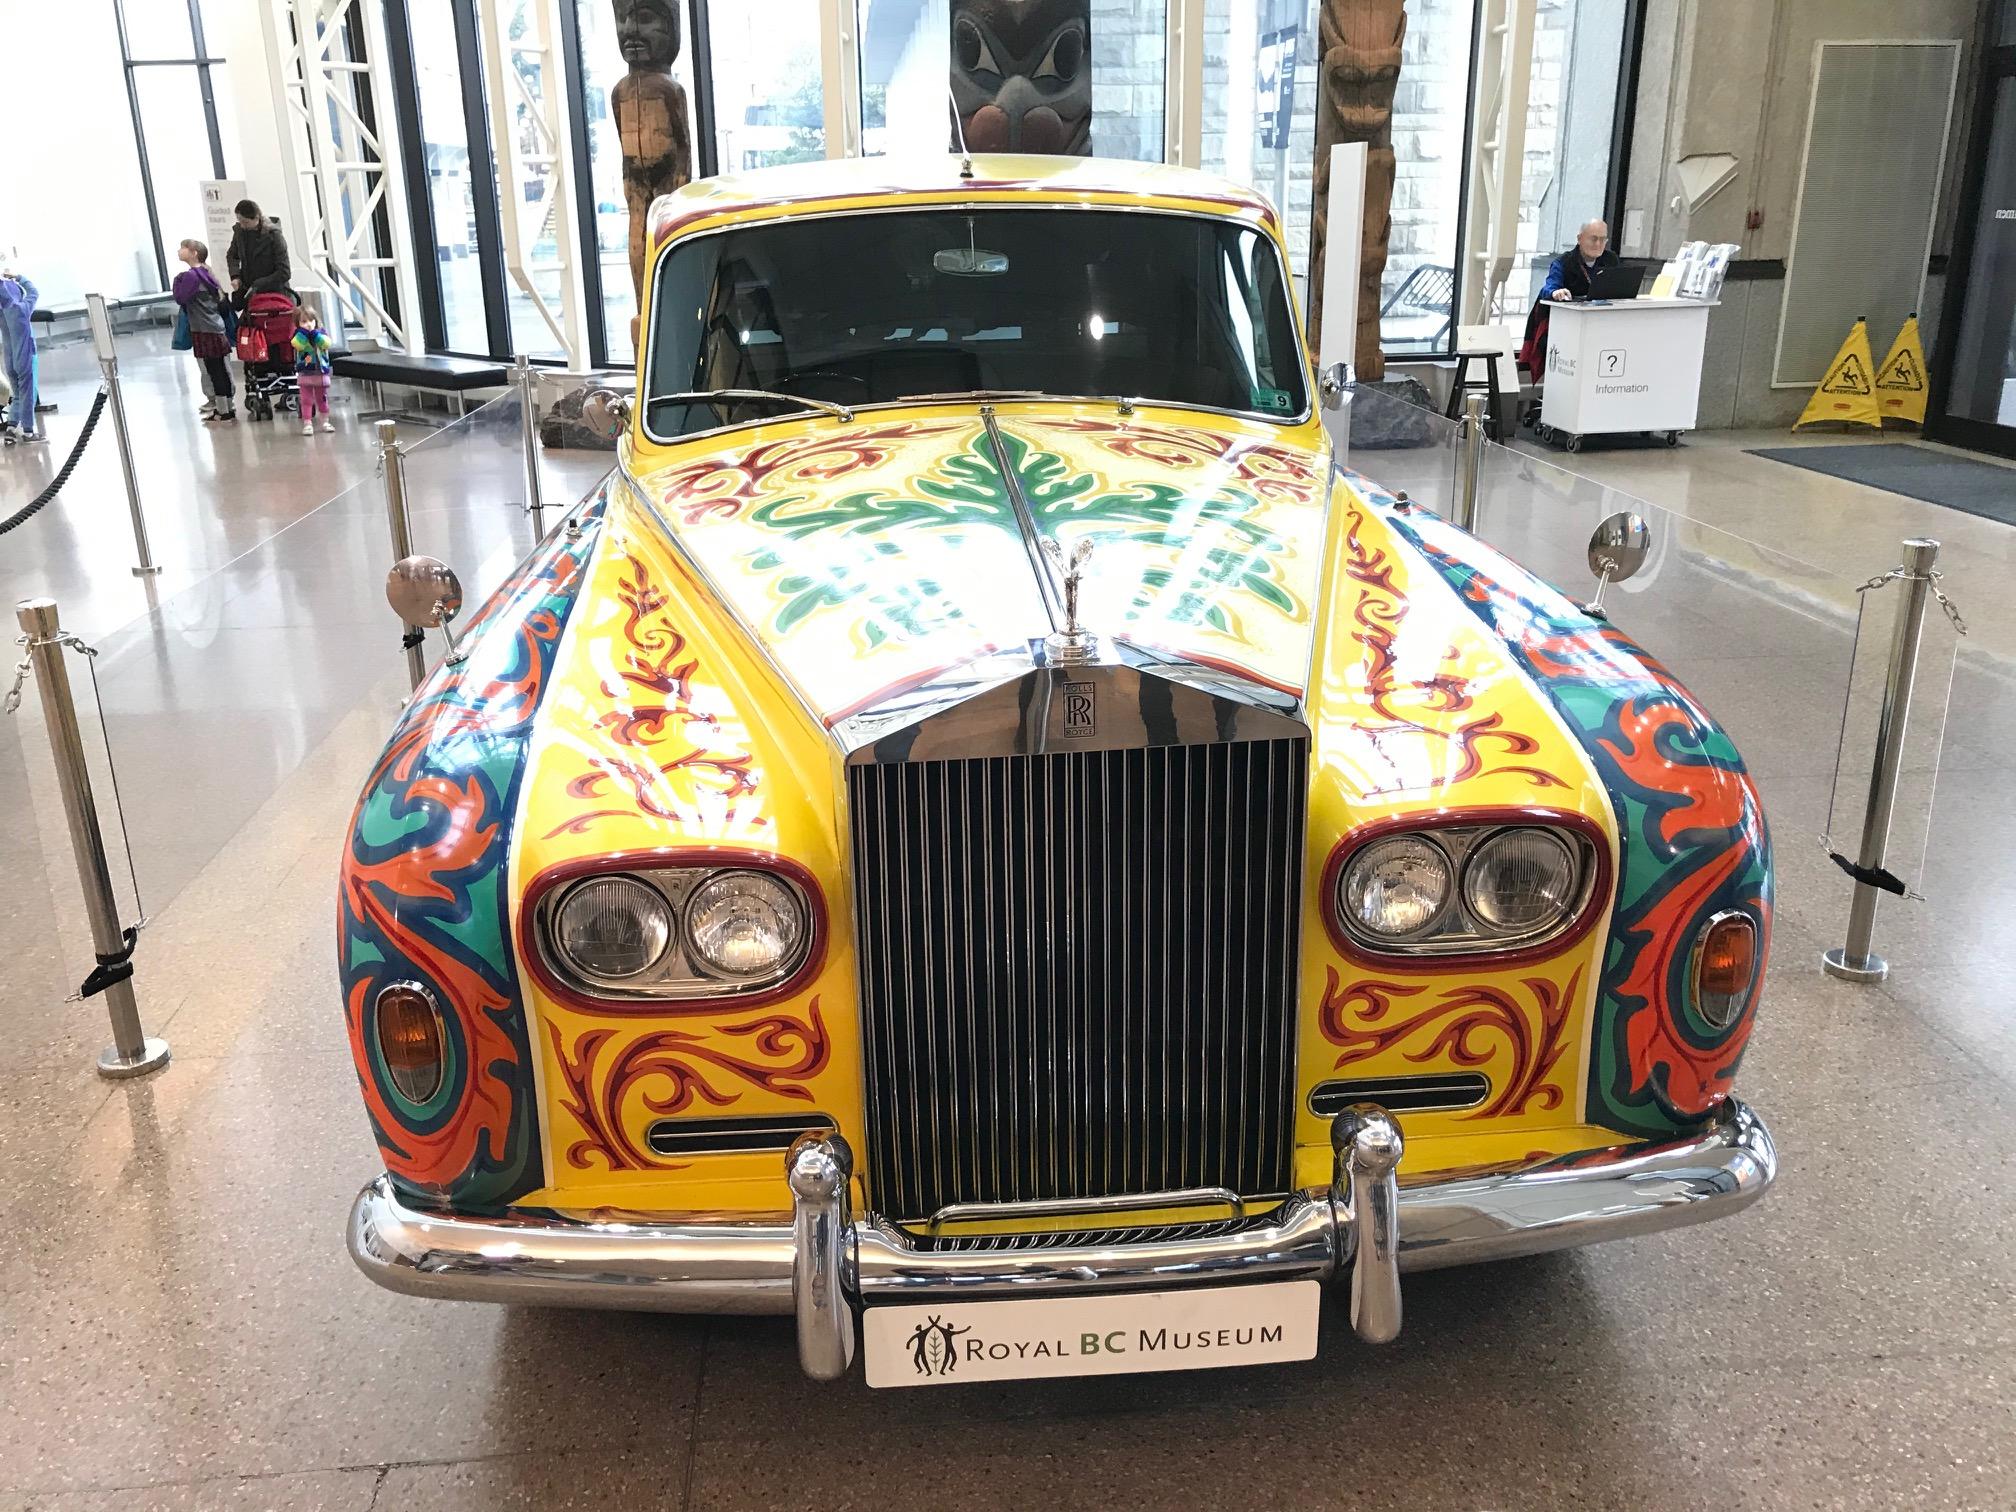 John Lennon S Historic Rolls Royce Now On Display At Royal Bc Museum Ctv News